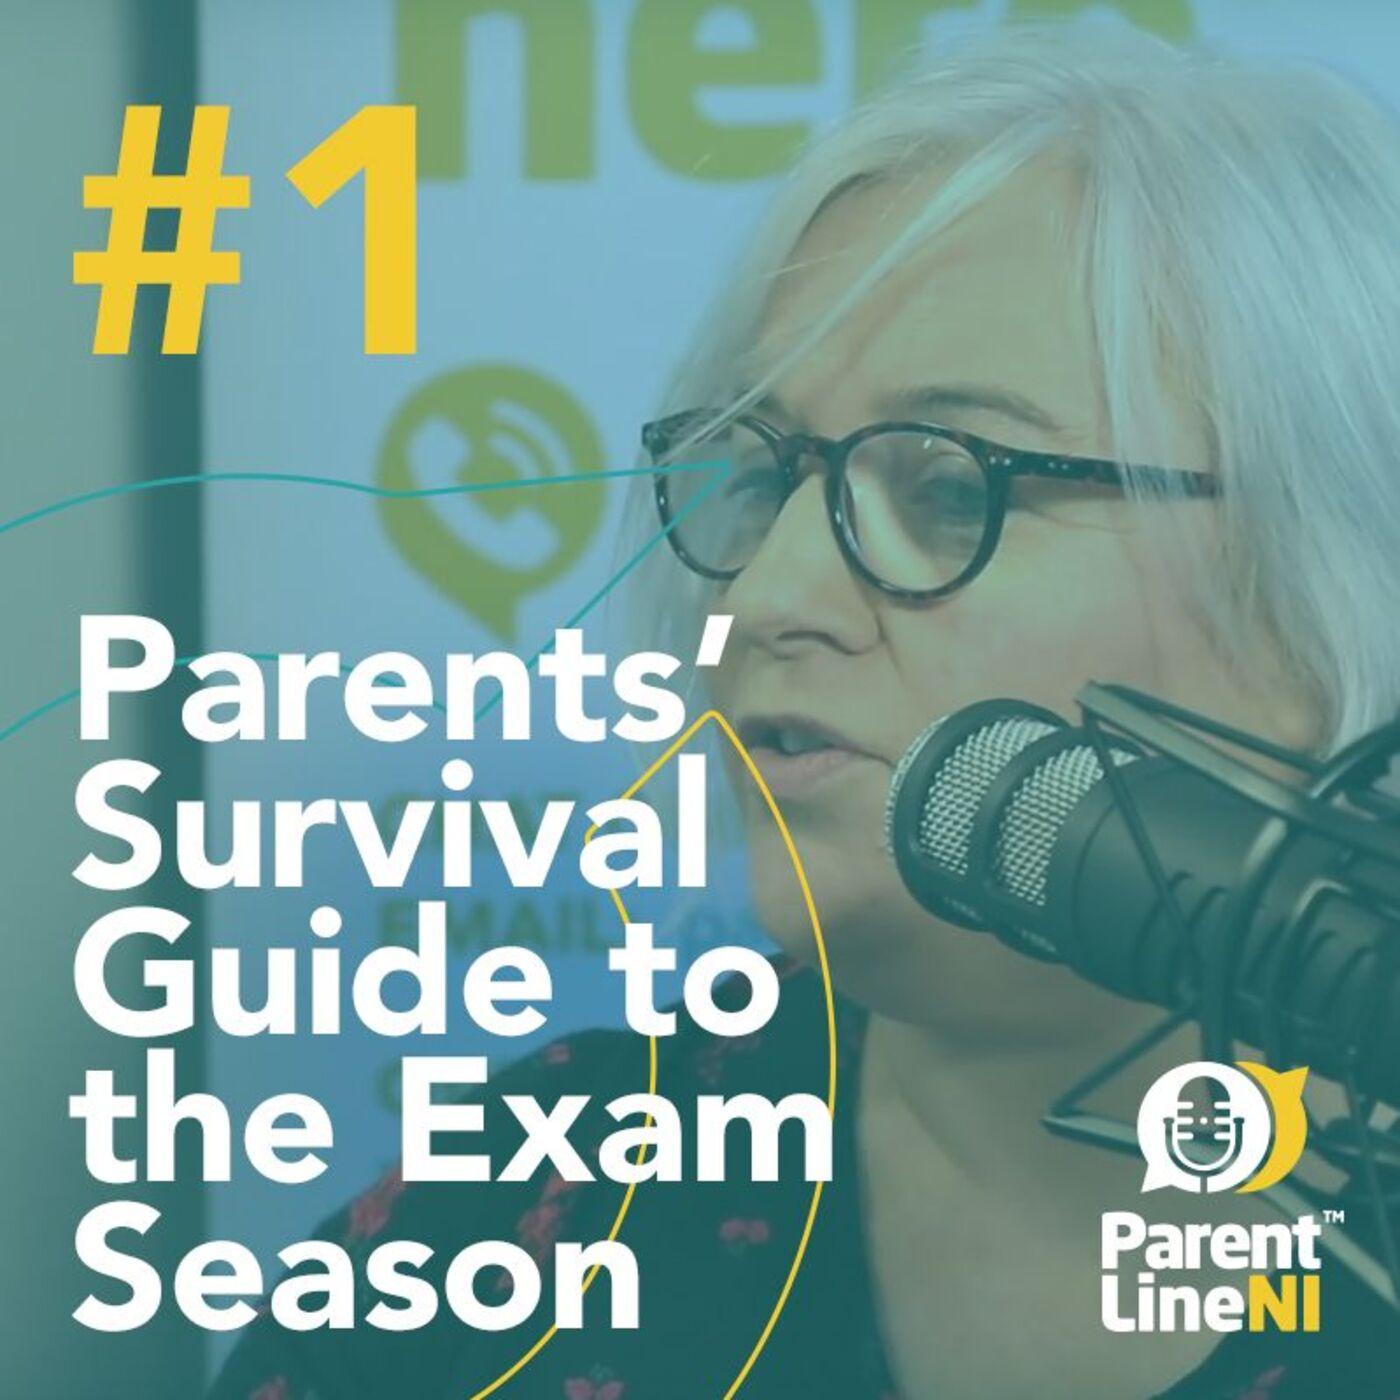 #1 - Parents' Survival Guide to Exam Season